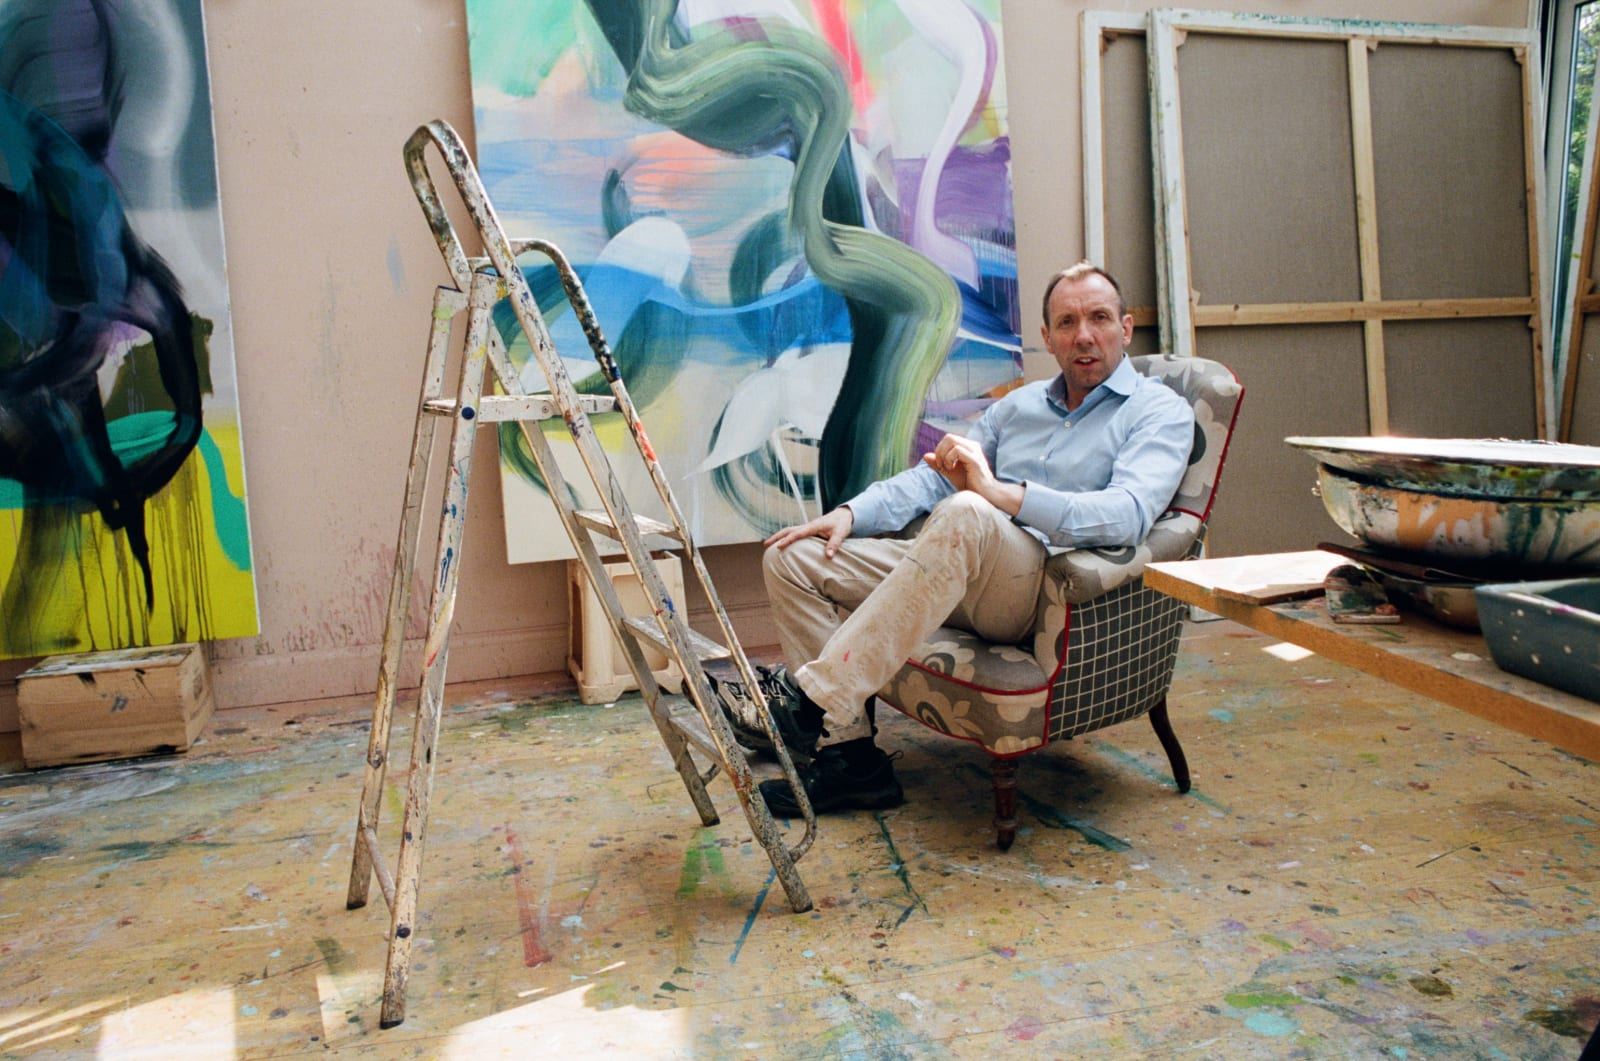 David Dawson | 2019 Prize Winner; Artist and Curator